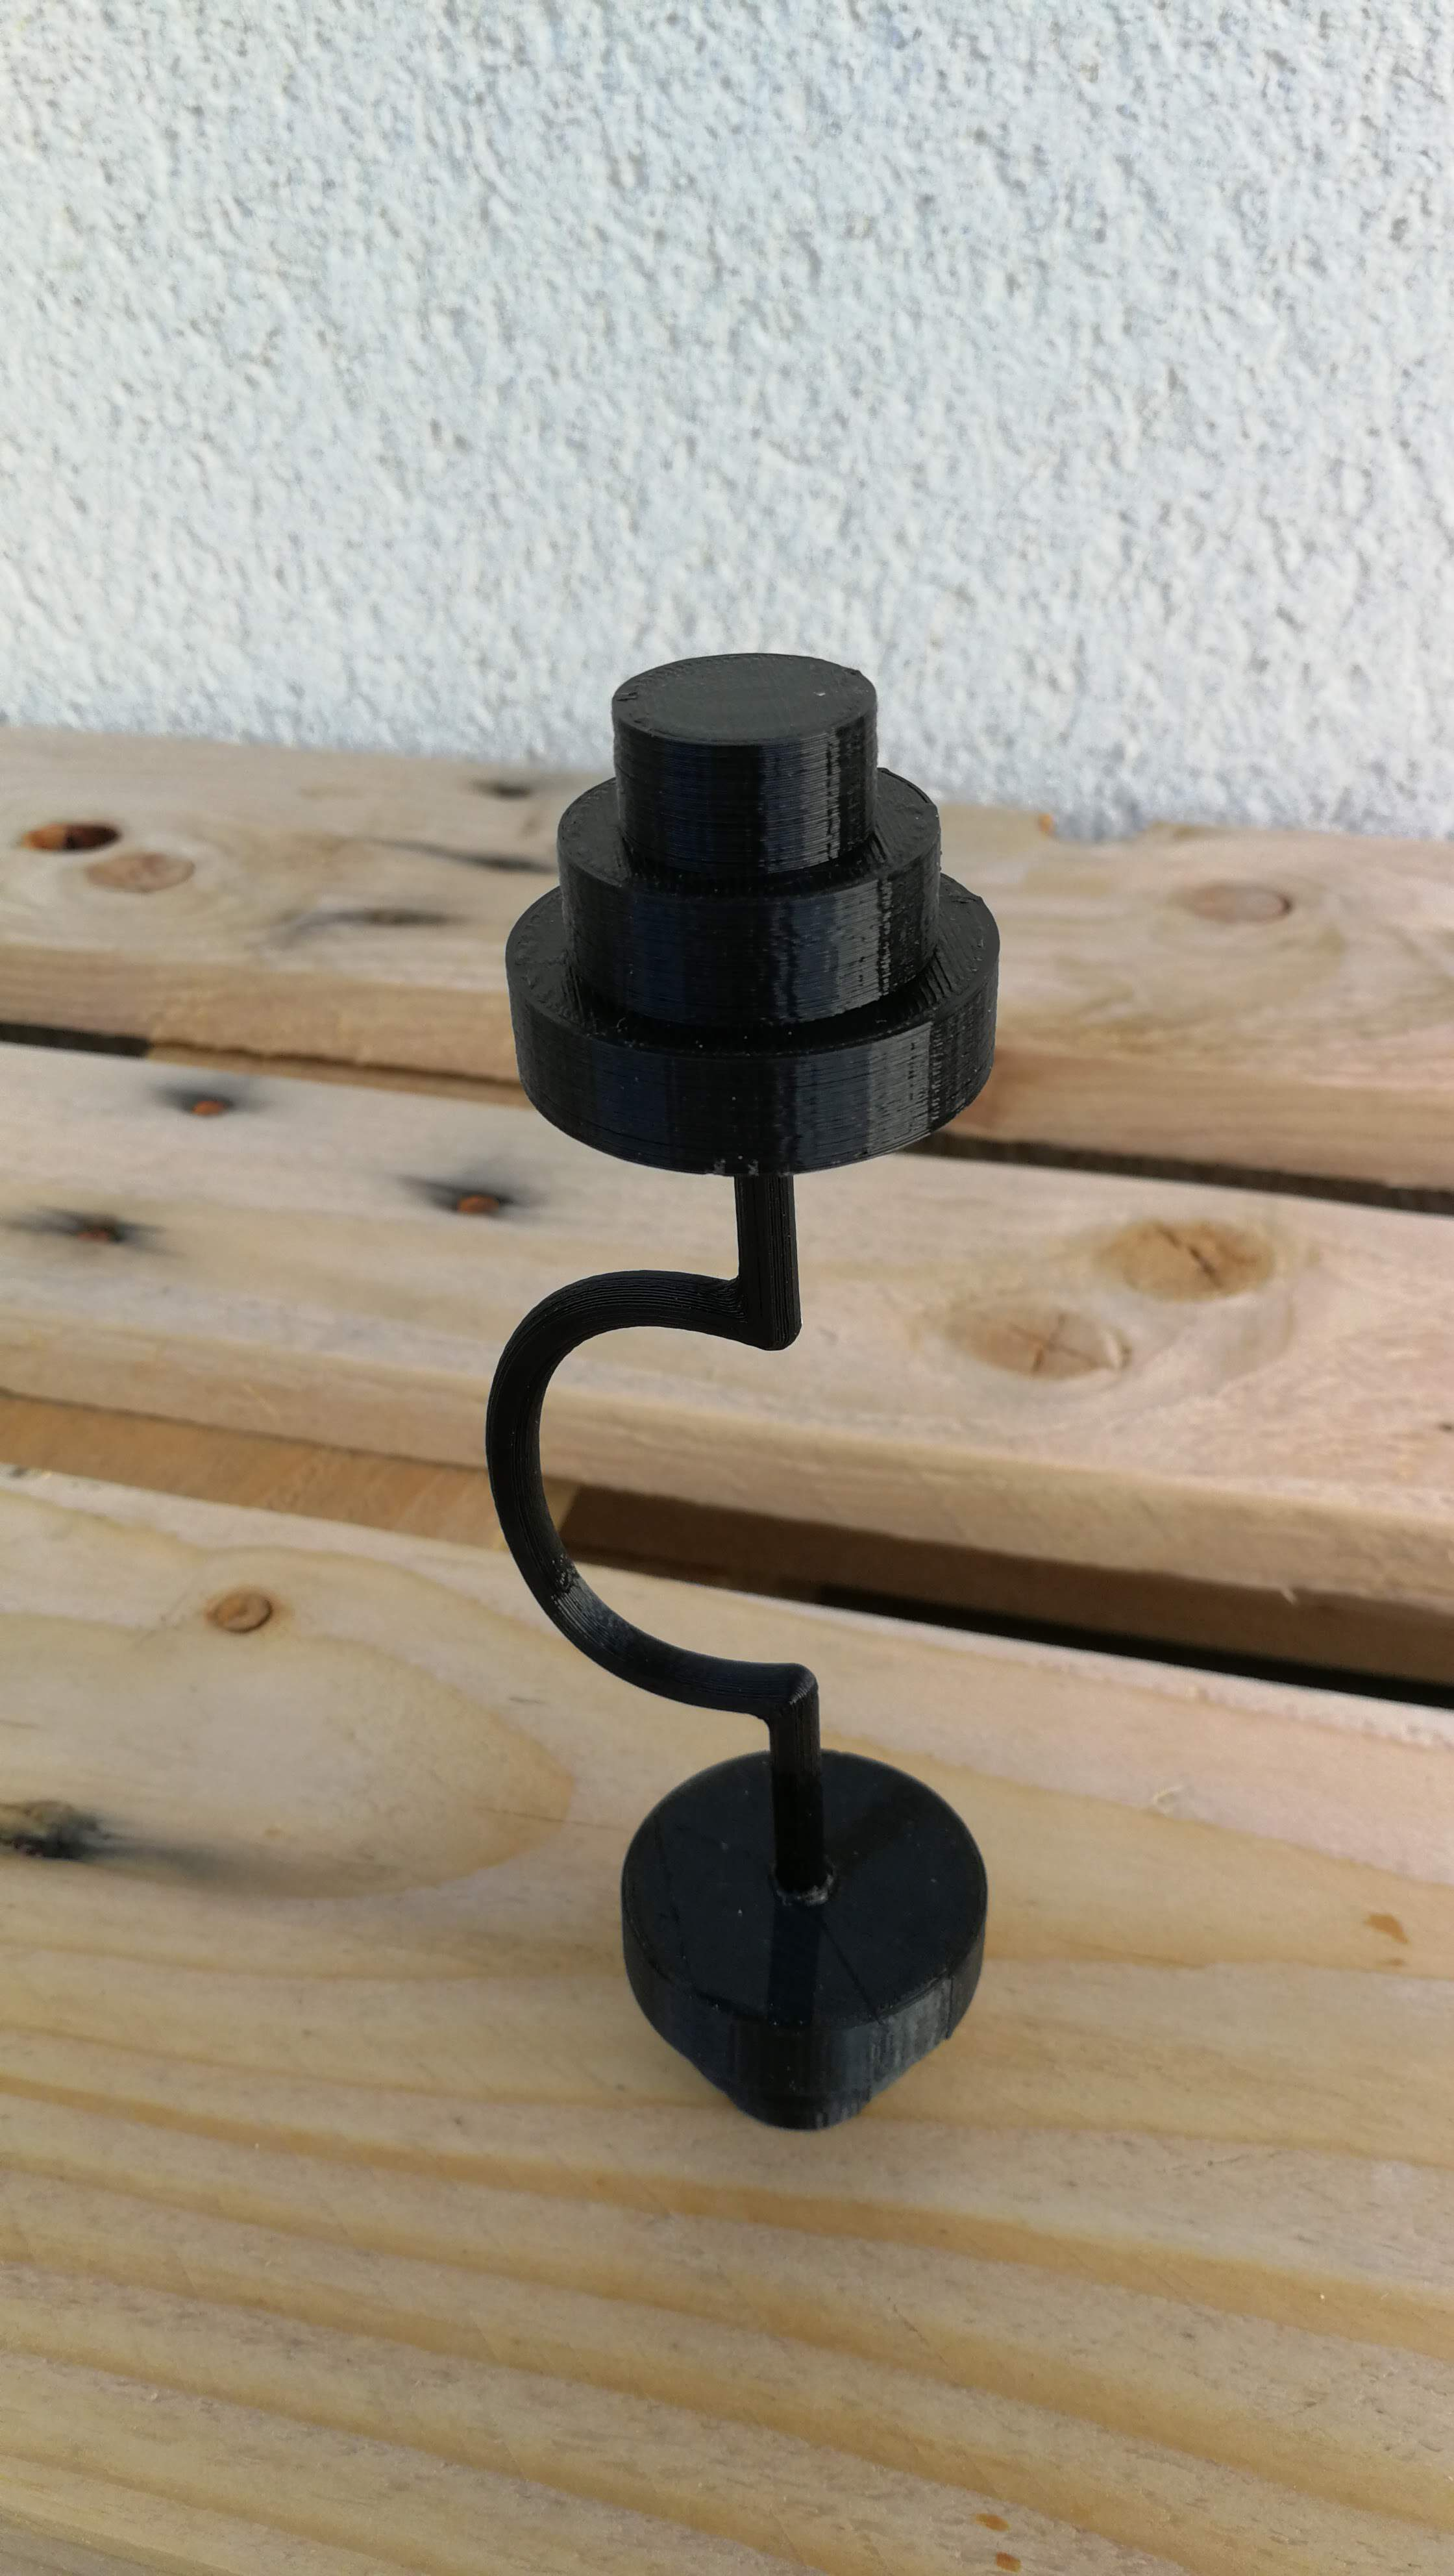 IMG_20180909_194838.jpg Download free STL file Zizi Dumbbell / Dumbbell Zizi Dumbbell • 3D printing template, Aneton3D